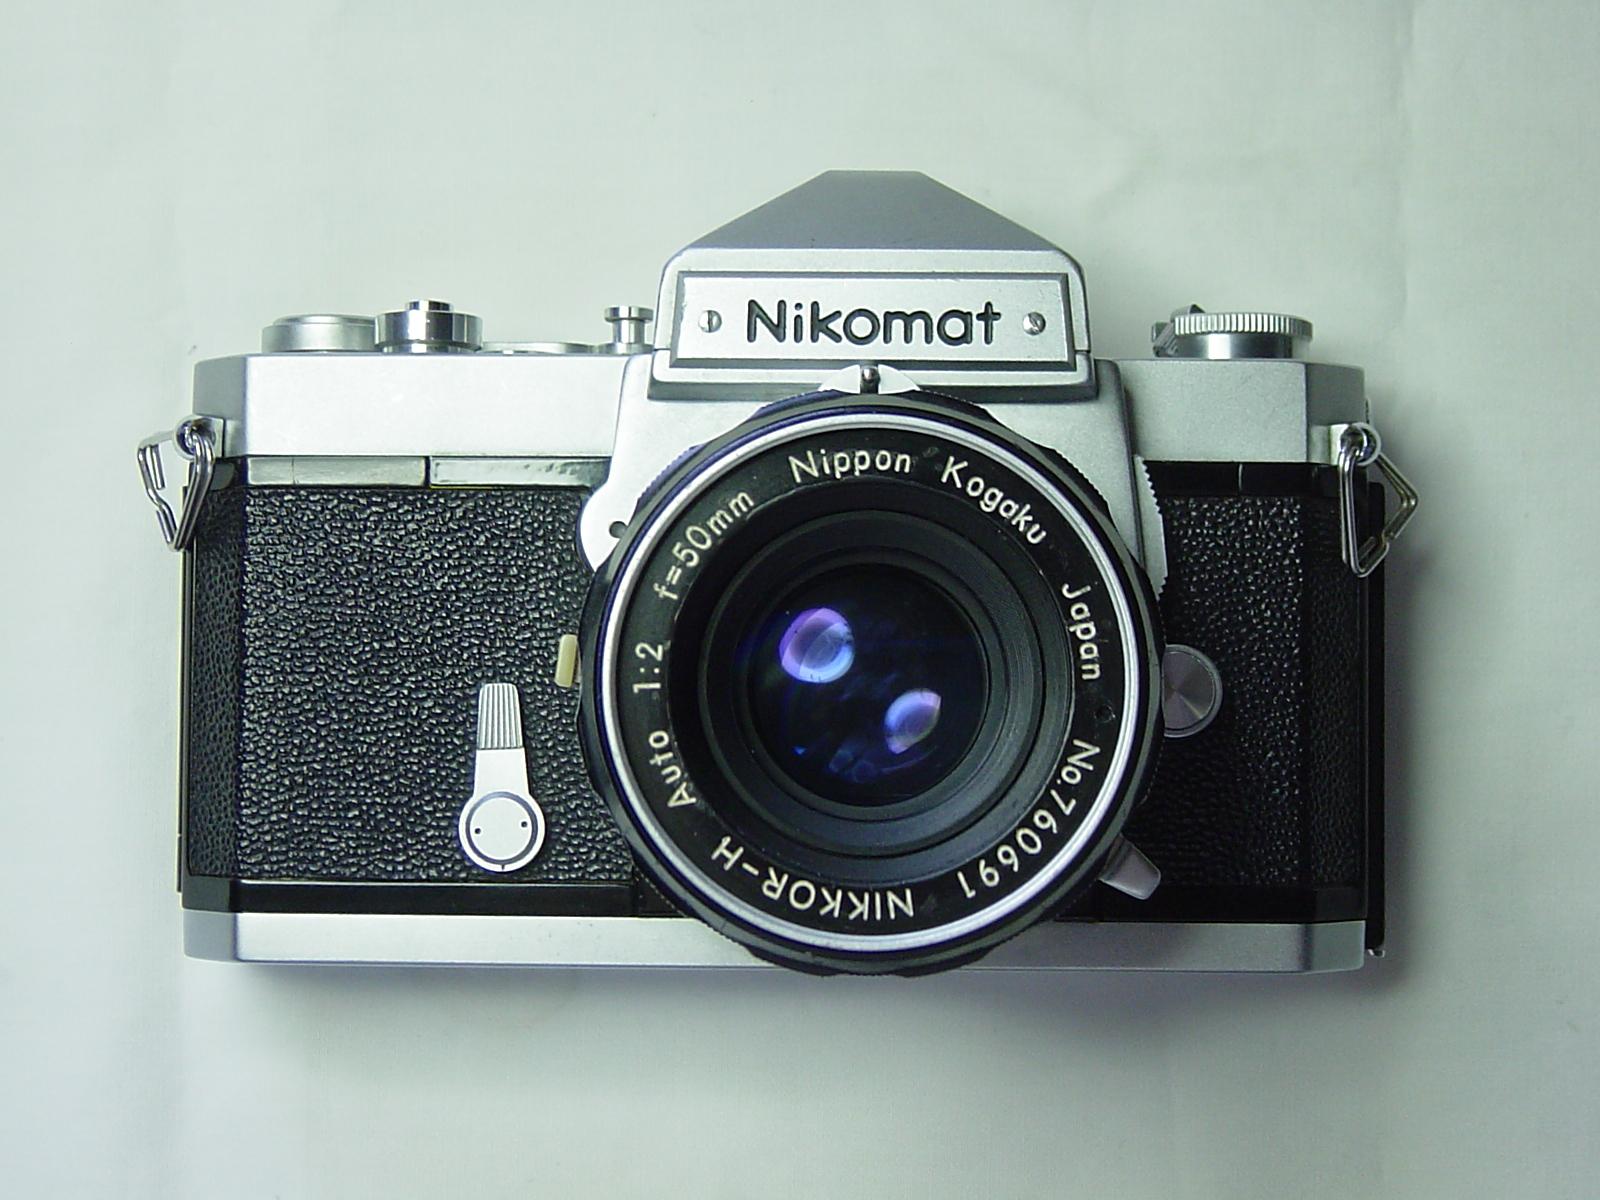 http://livedoor.blogimg.jp/camera_repair_minoha/imgs/1/8/18cc459e.JPG